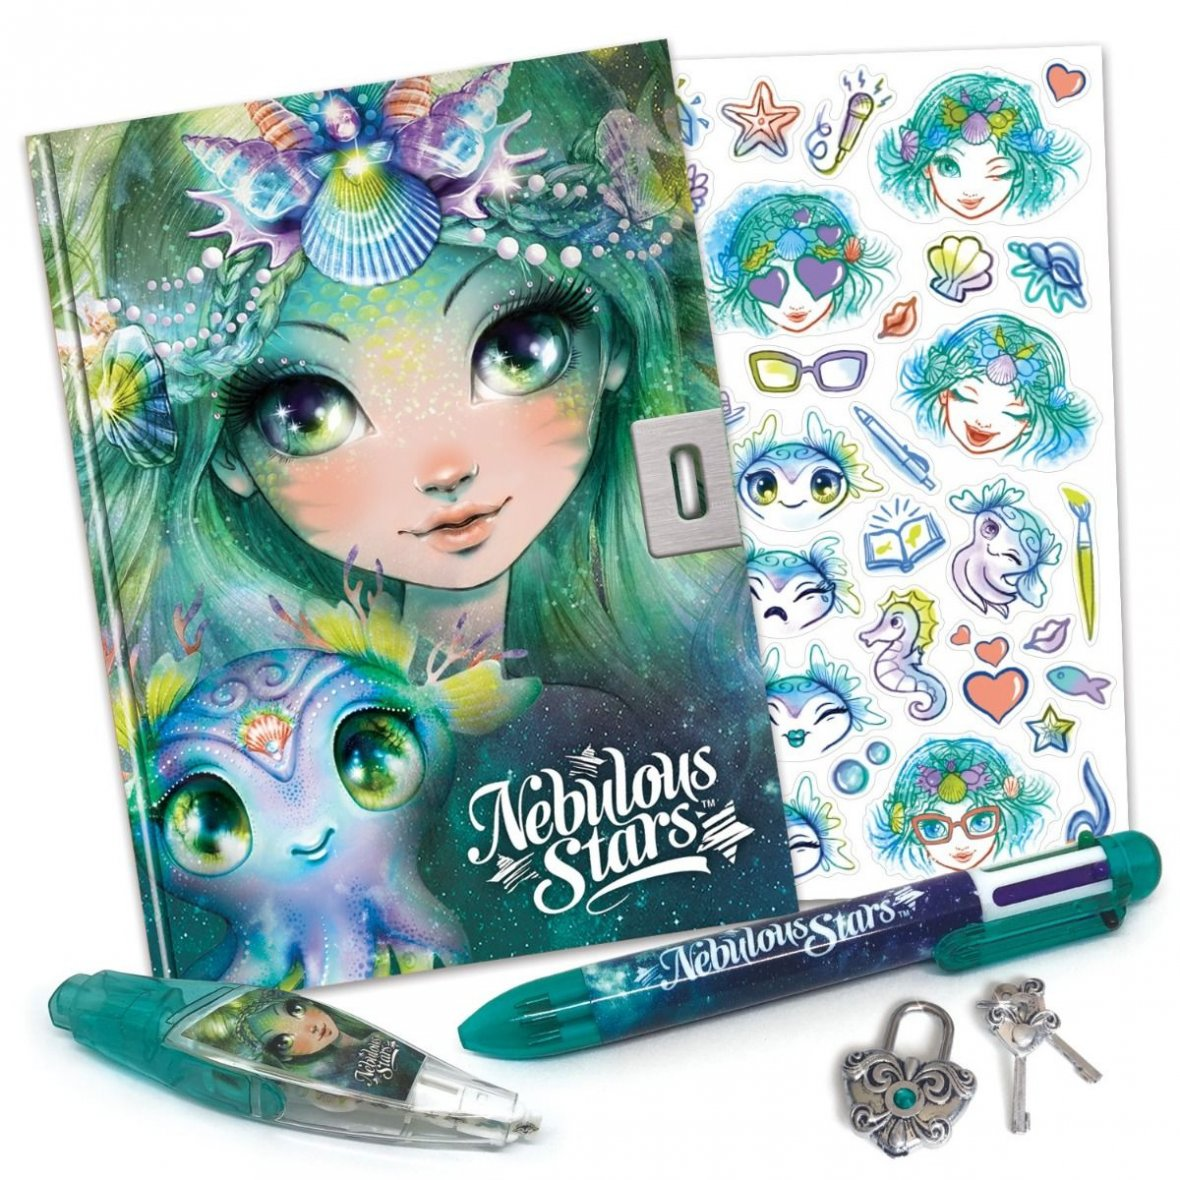 Nebulous Stars journal intime  Marinia